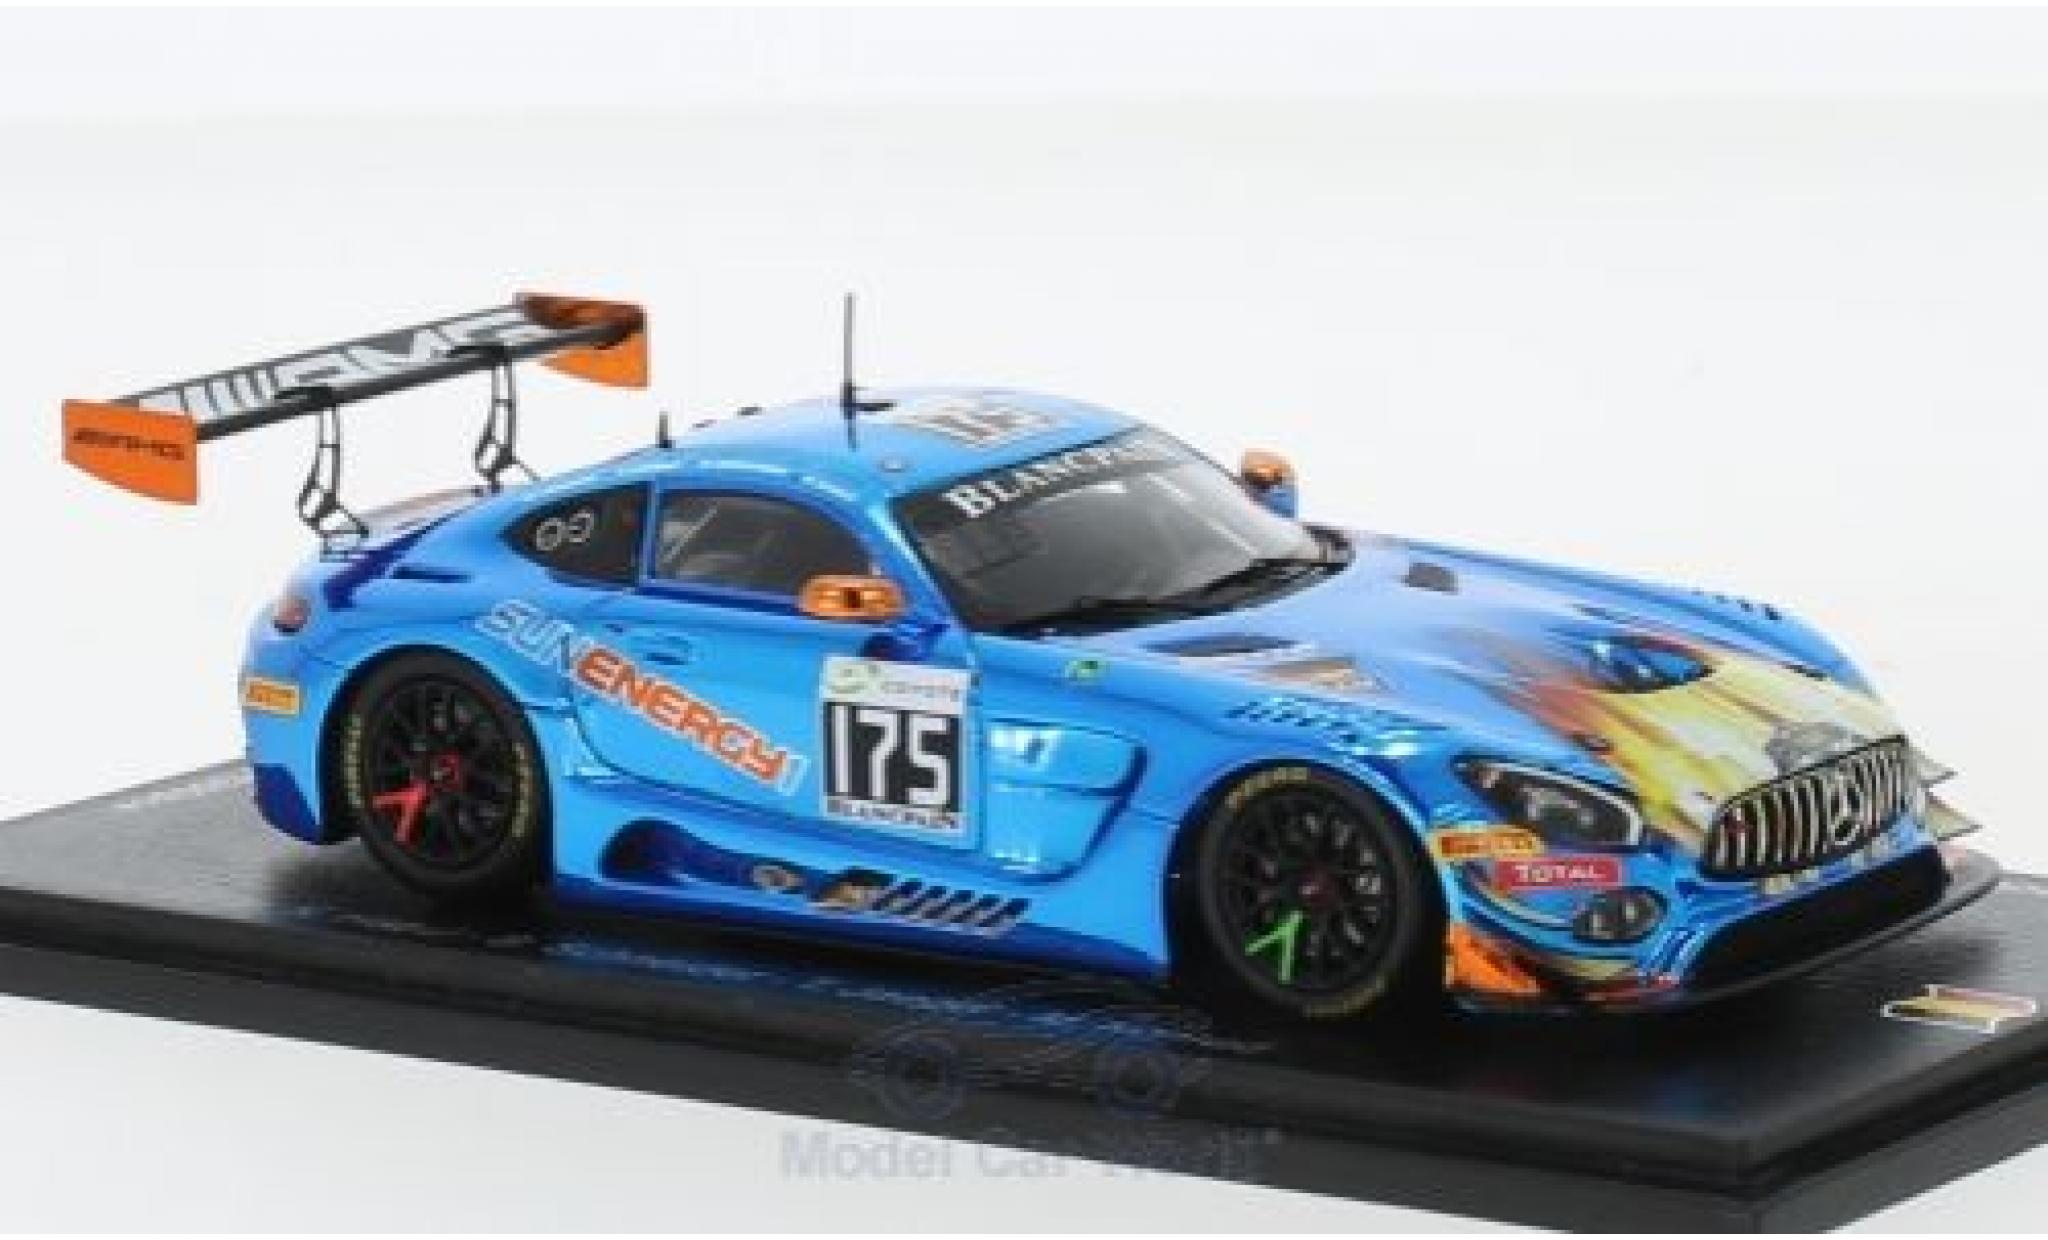 Mercedes AMG GT 1/43 Spark 3 No.175 Sun Energy 1 Team HTP Motorsport 24h Spa 2018 K.Habul/B.Schneider/T.Jäger/M.Konrad